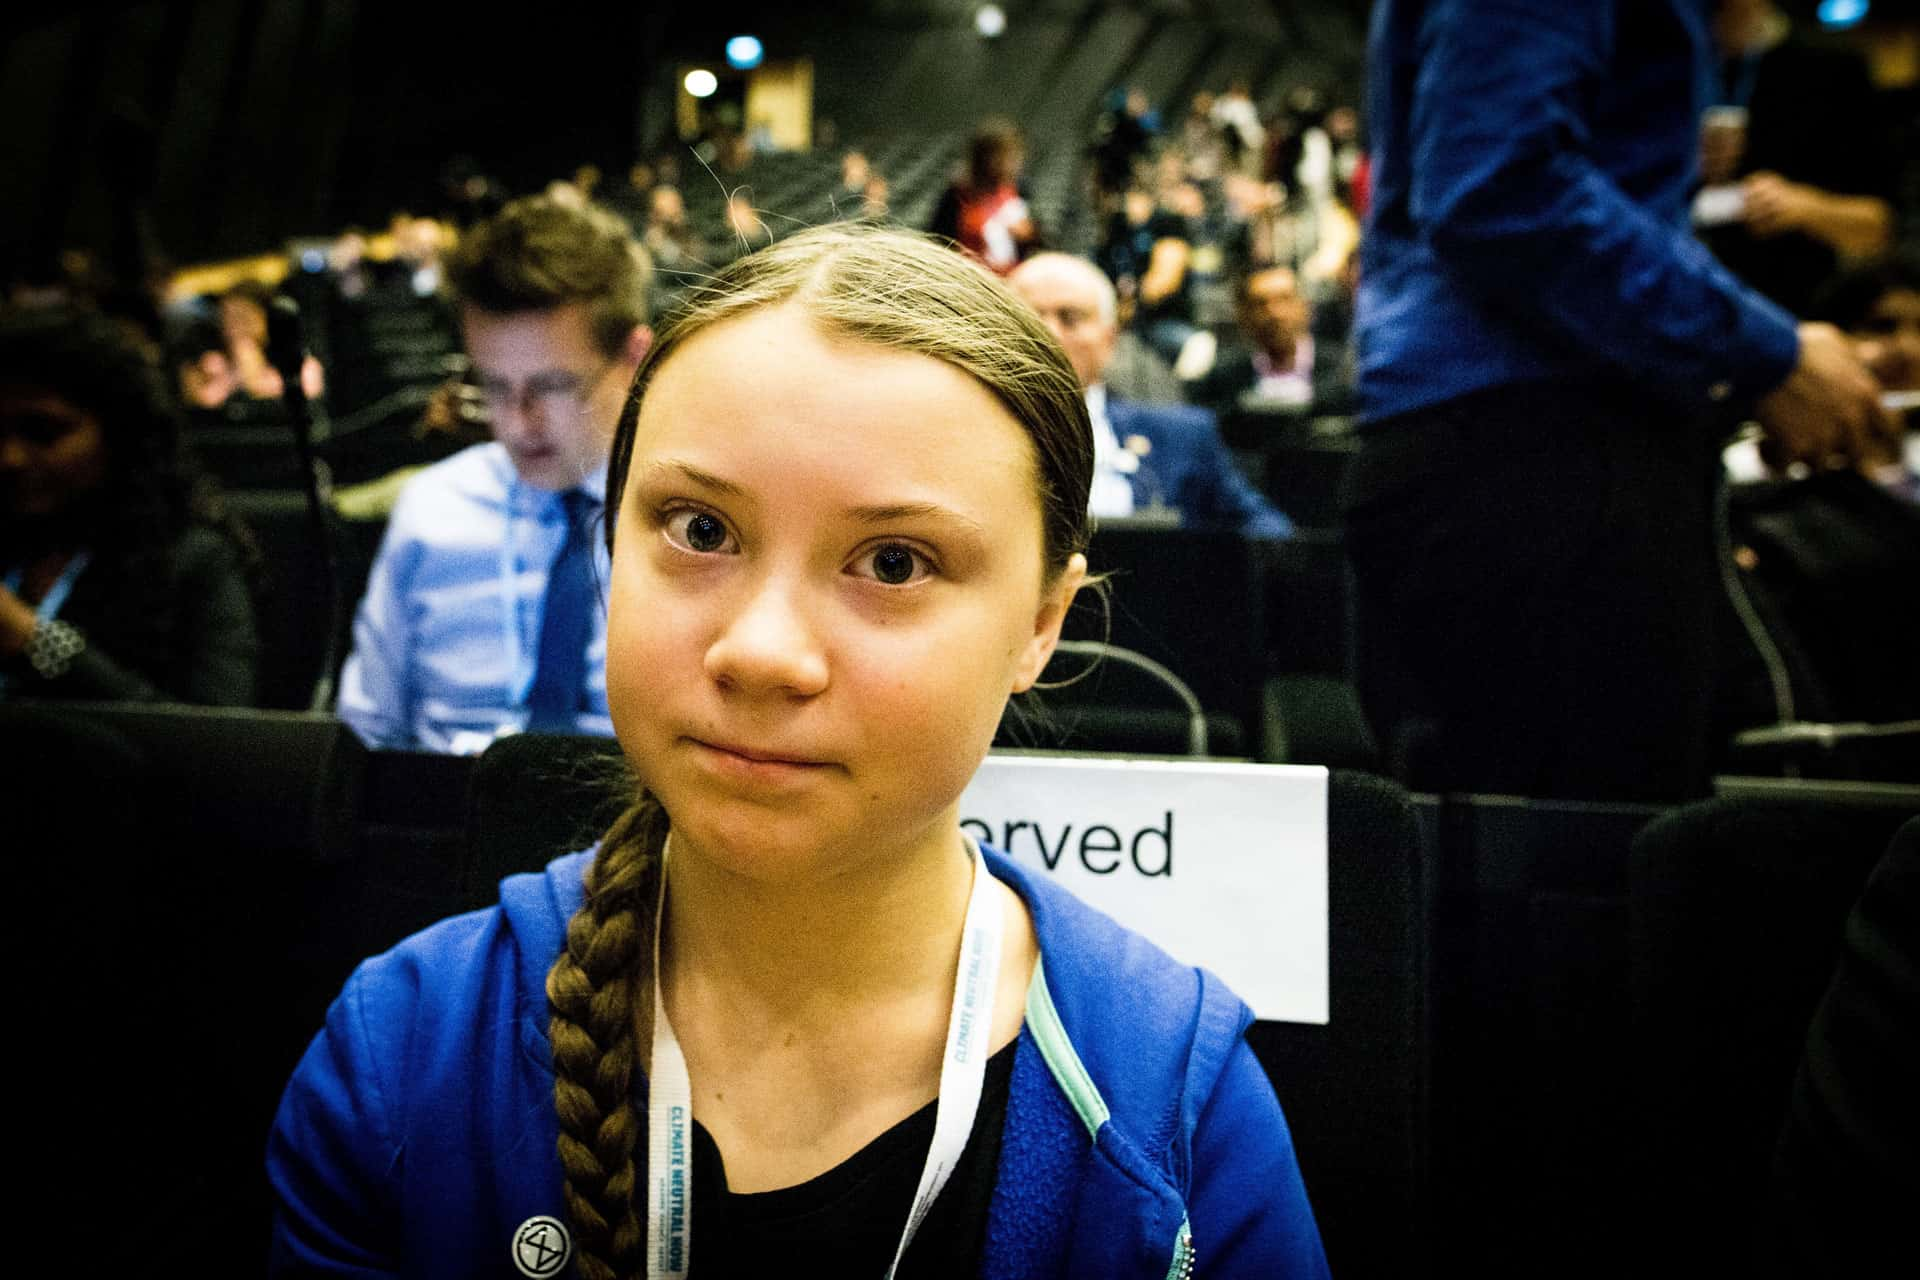 Klimaschützerin Greta Thunberg